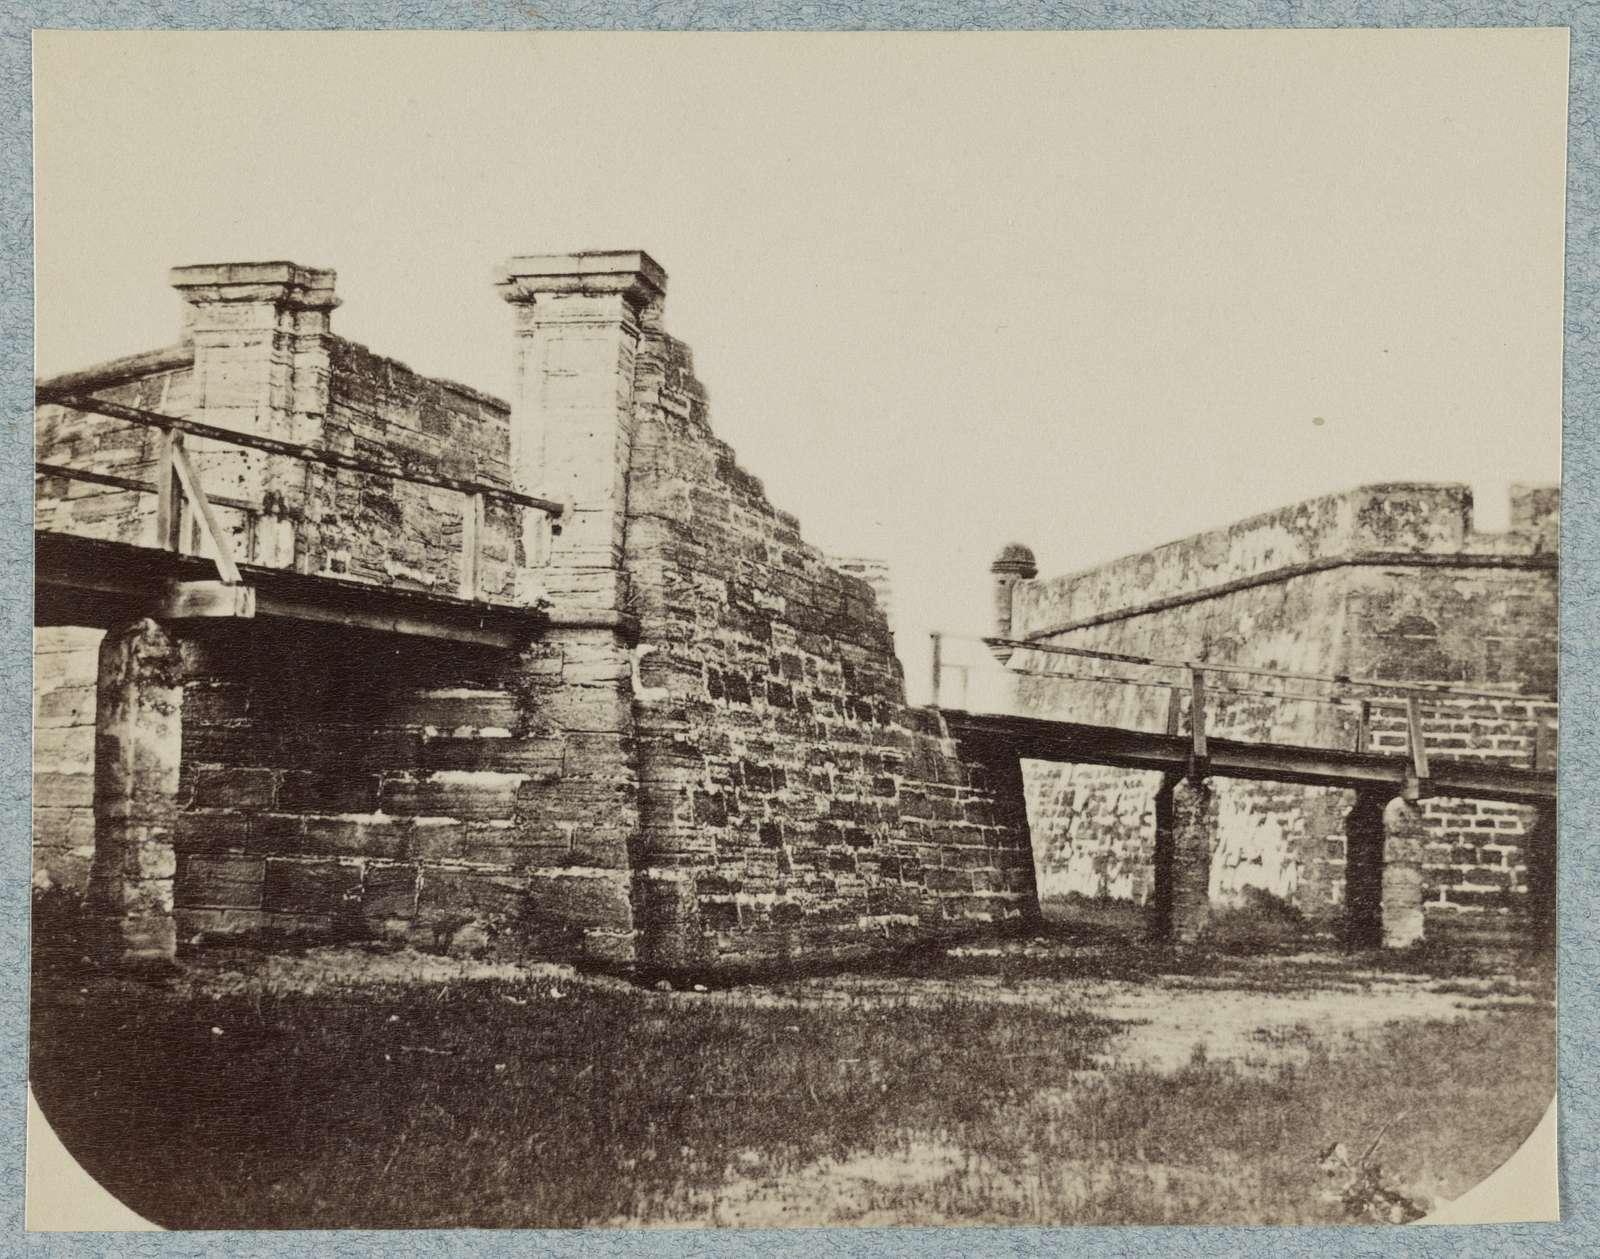 Fort Marion, Saint Augustine, Florida